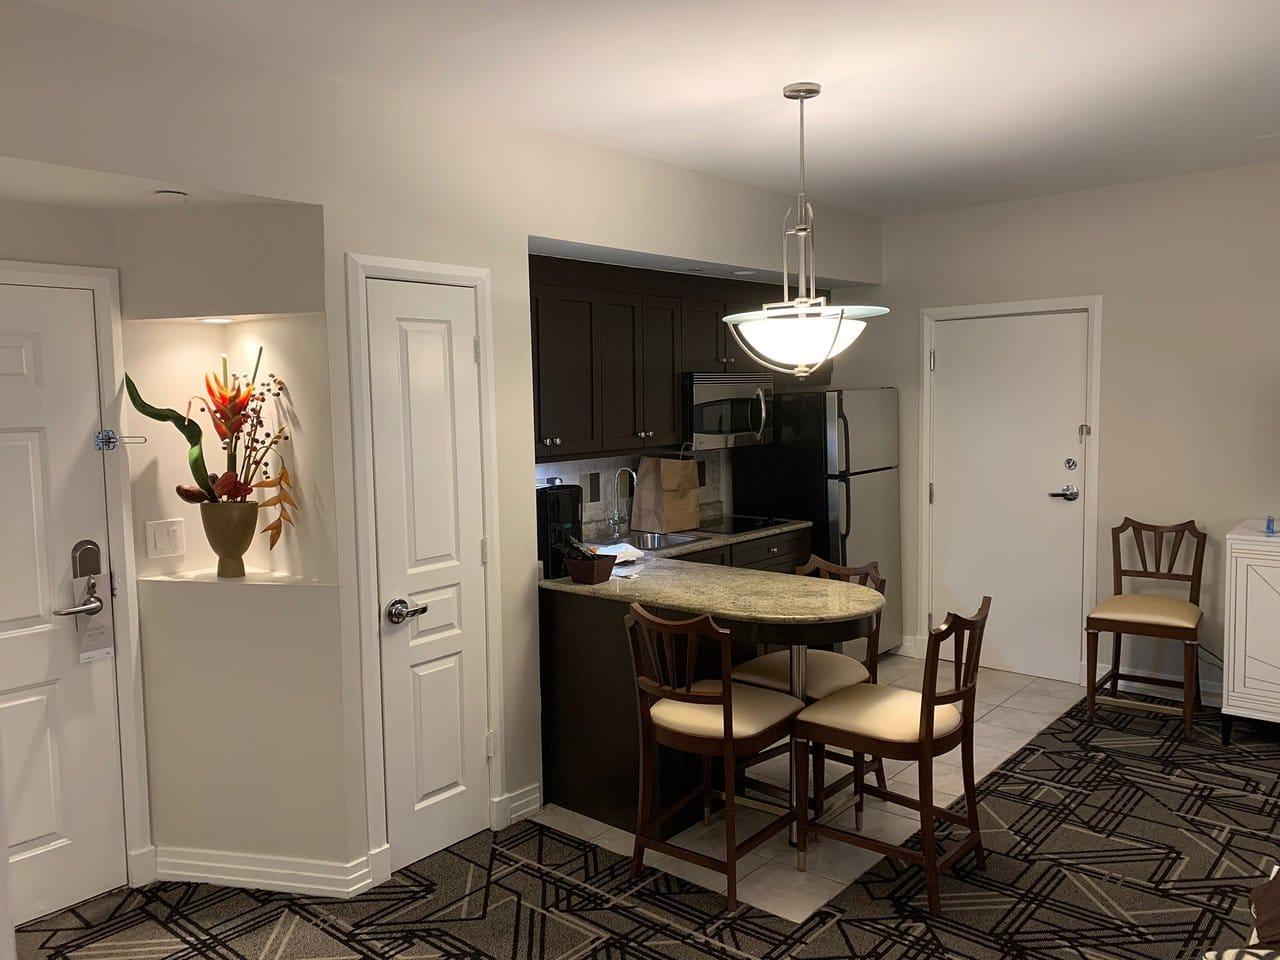 Hilton Grand Vacations at McAlpin-Ocean Plaza Kitchen